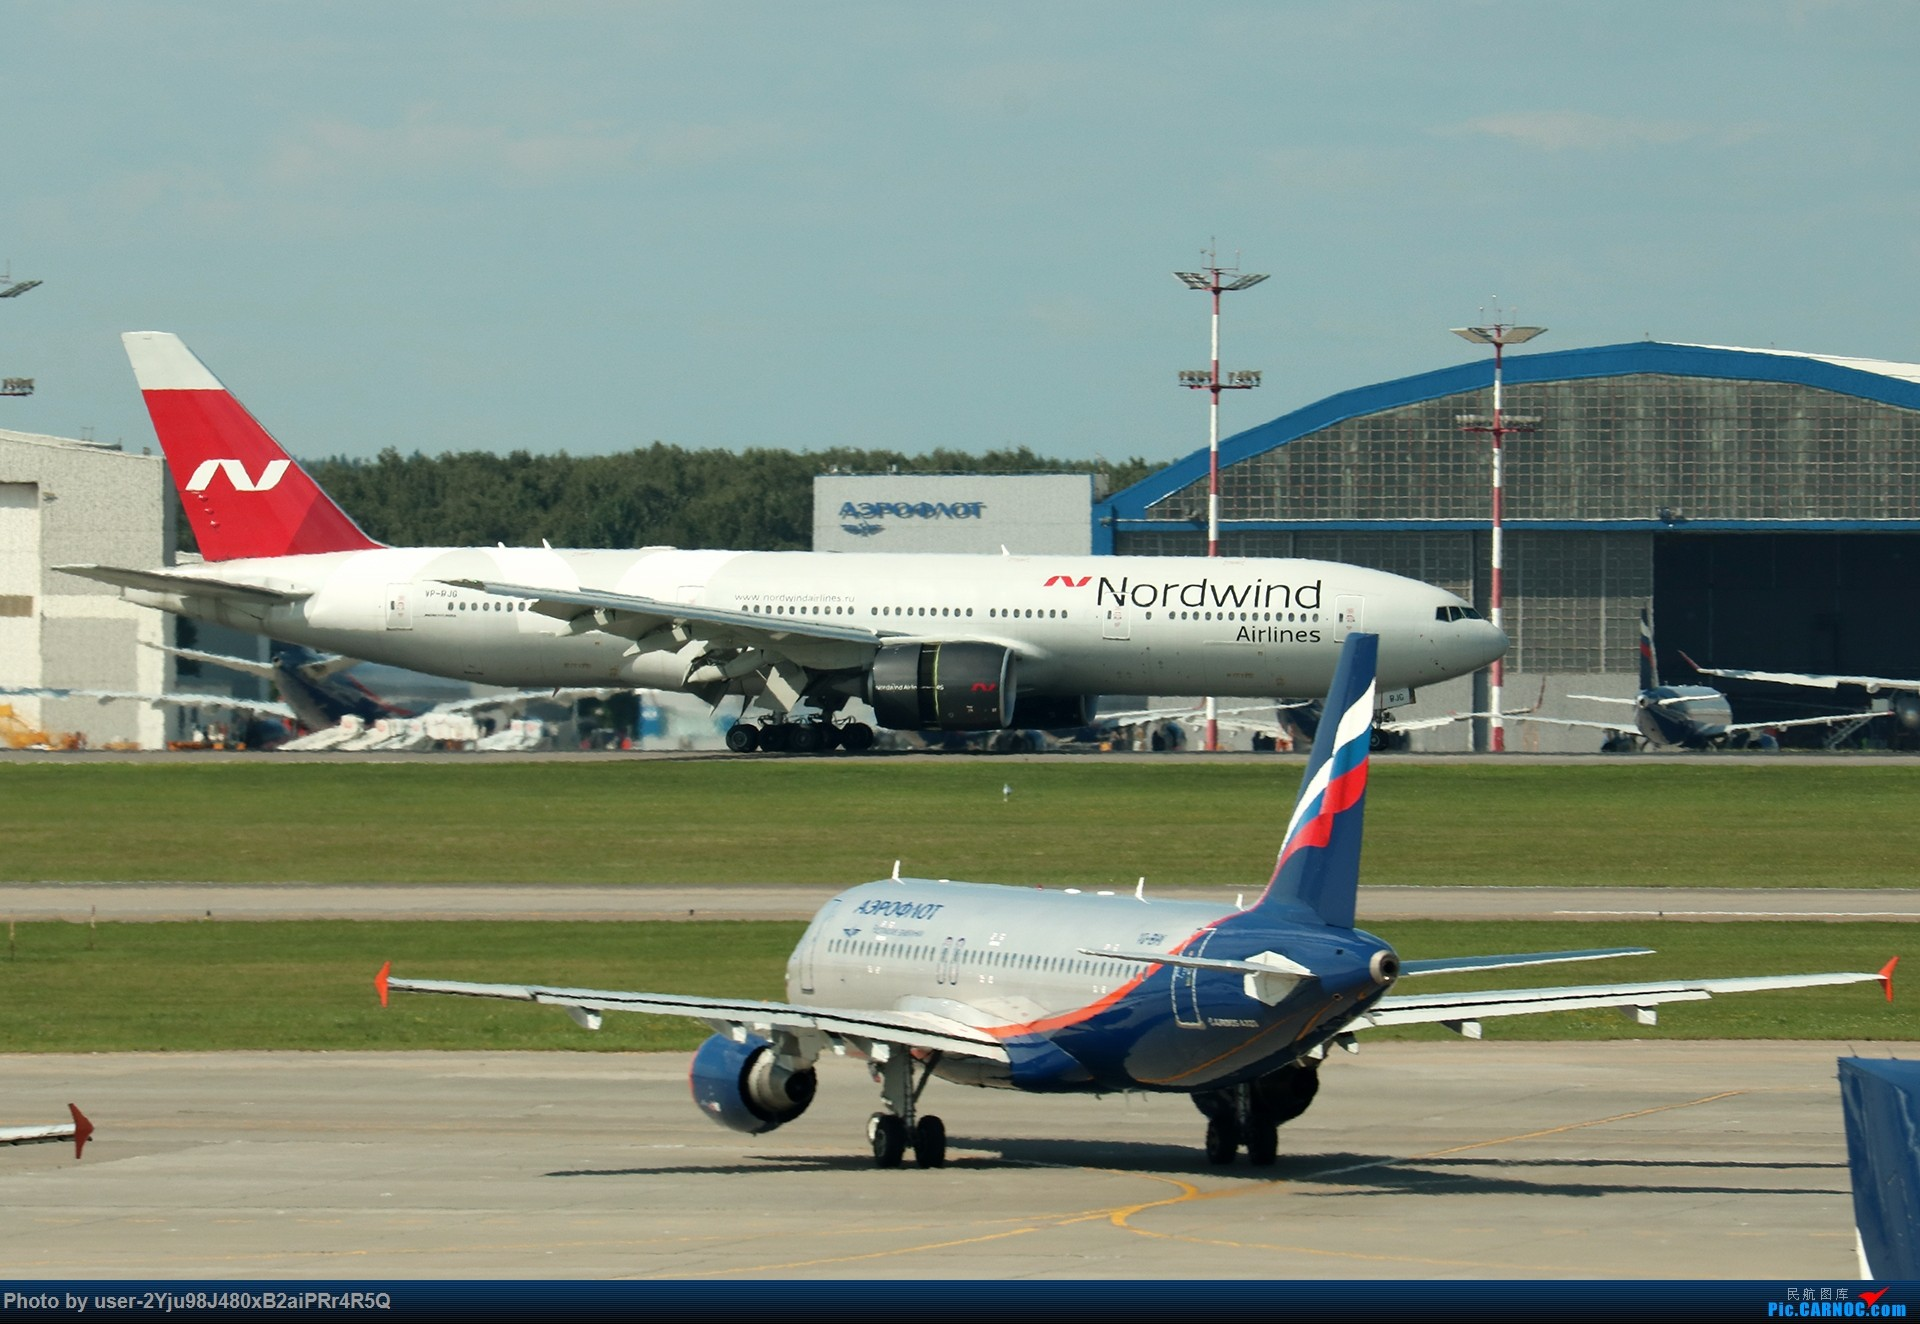 Re:[原创]LIULIU|Sheremetyevo的漫游|其他篇 BOEING 777-2Q8(ER) VP-BJG 俄罗斯谢诺梅杰沃机场